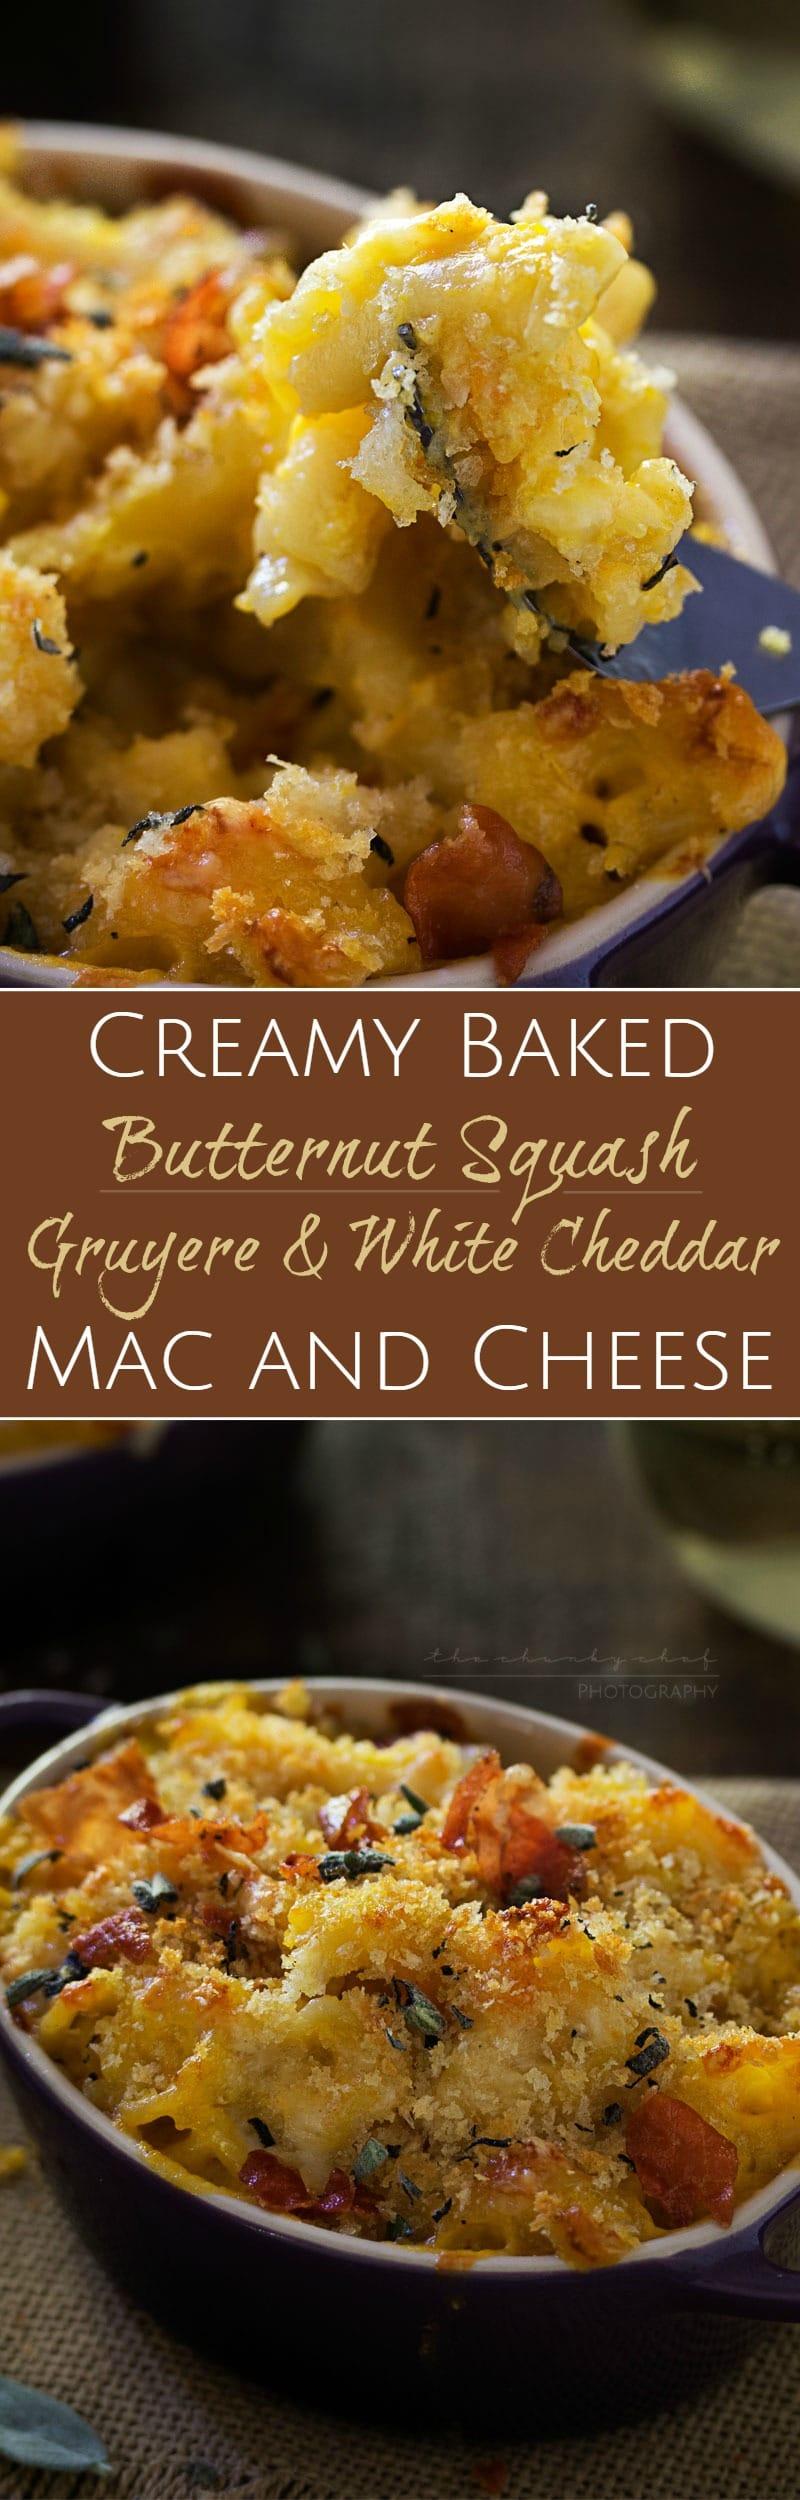 Butternut Squash, Gruyere and White Cheddar Mac and CheeseThe